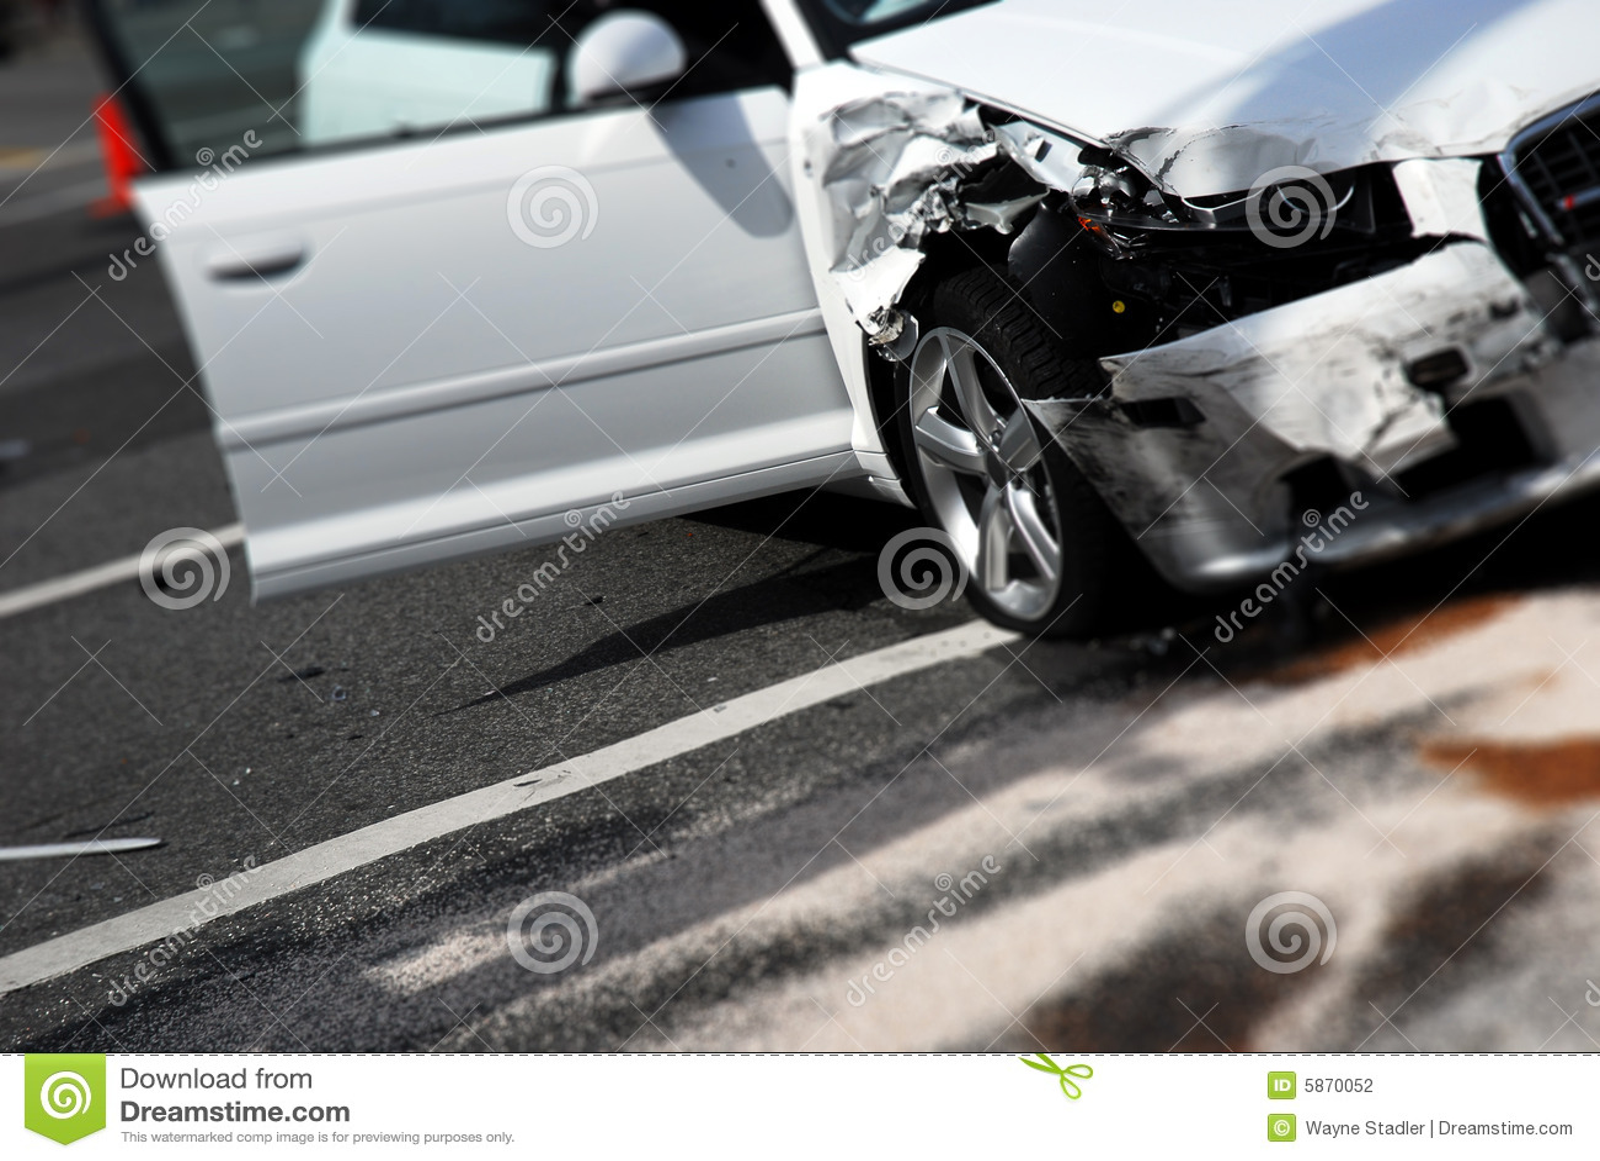 Guaime di incidente stradale